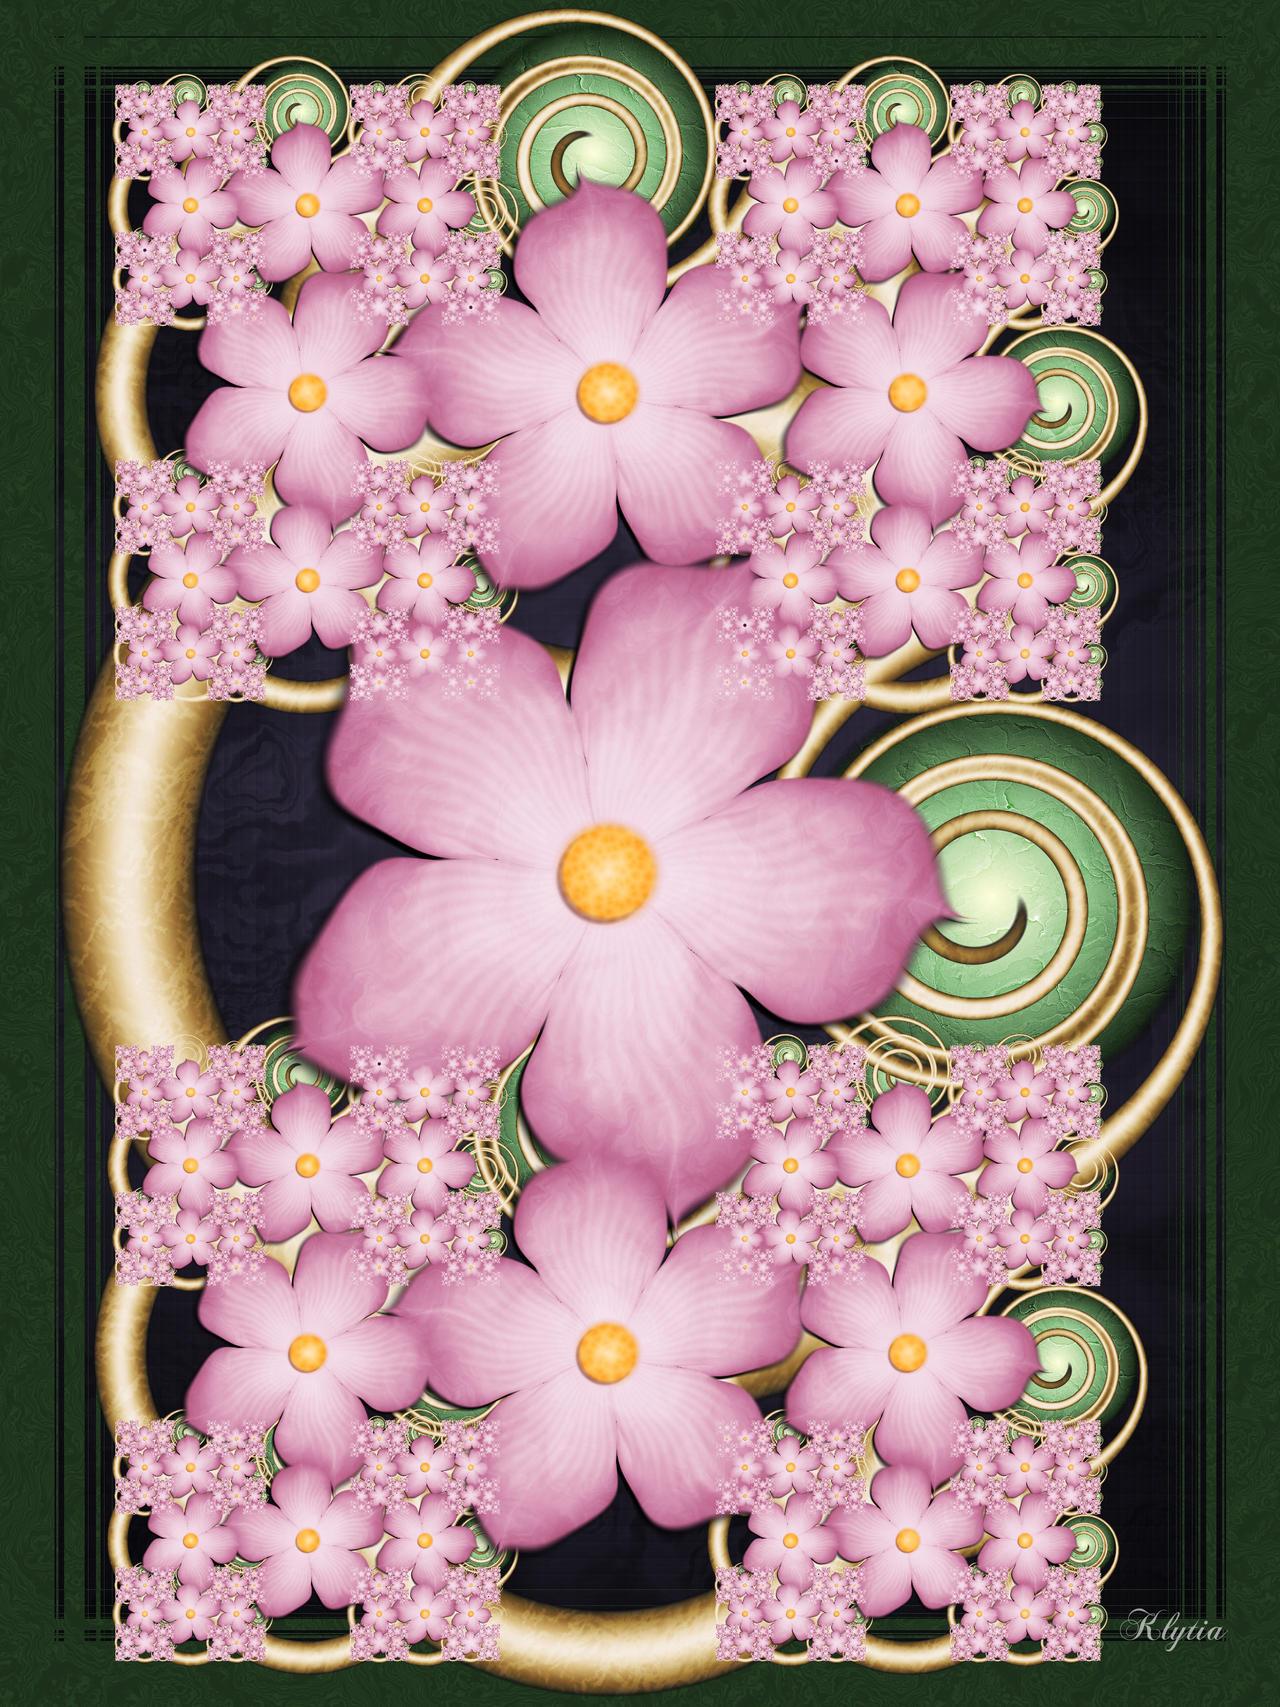 Full bloom by Klytia70